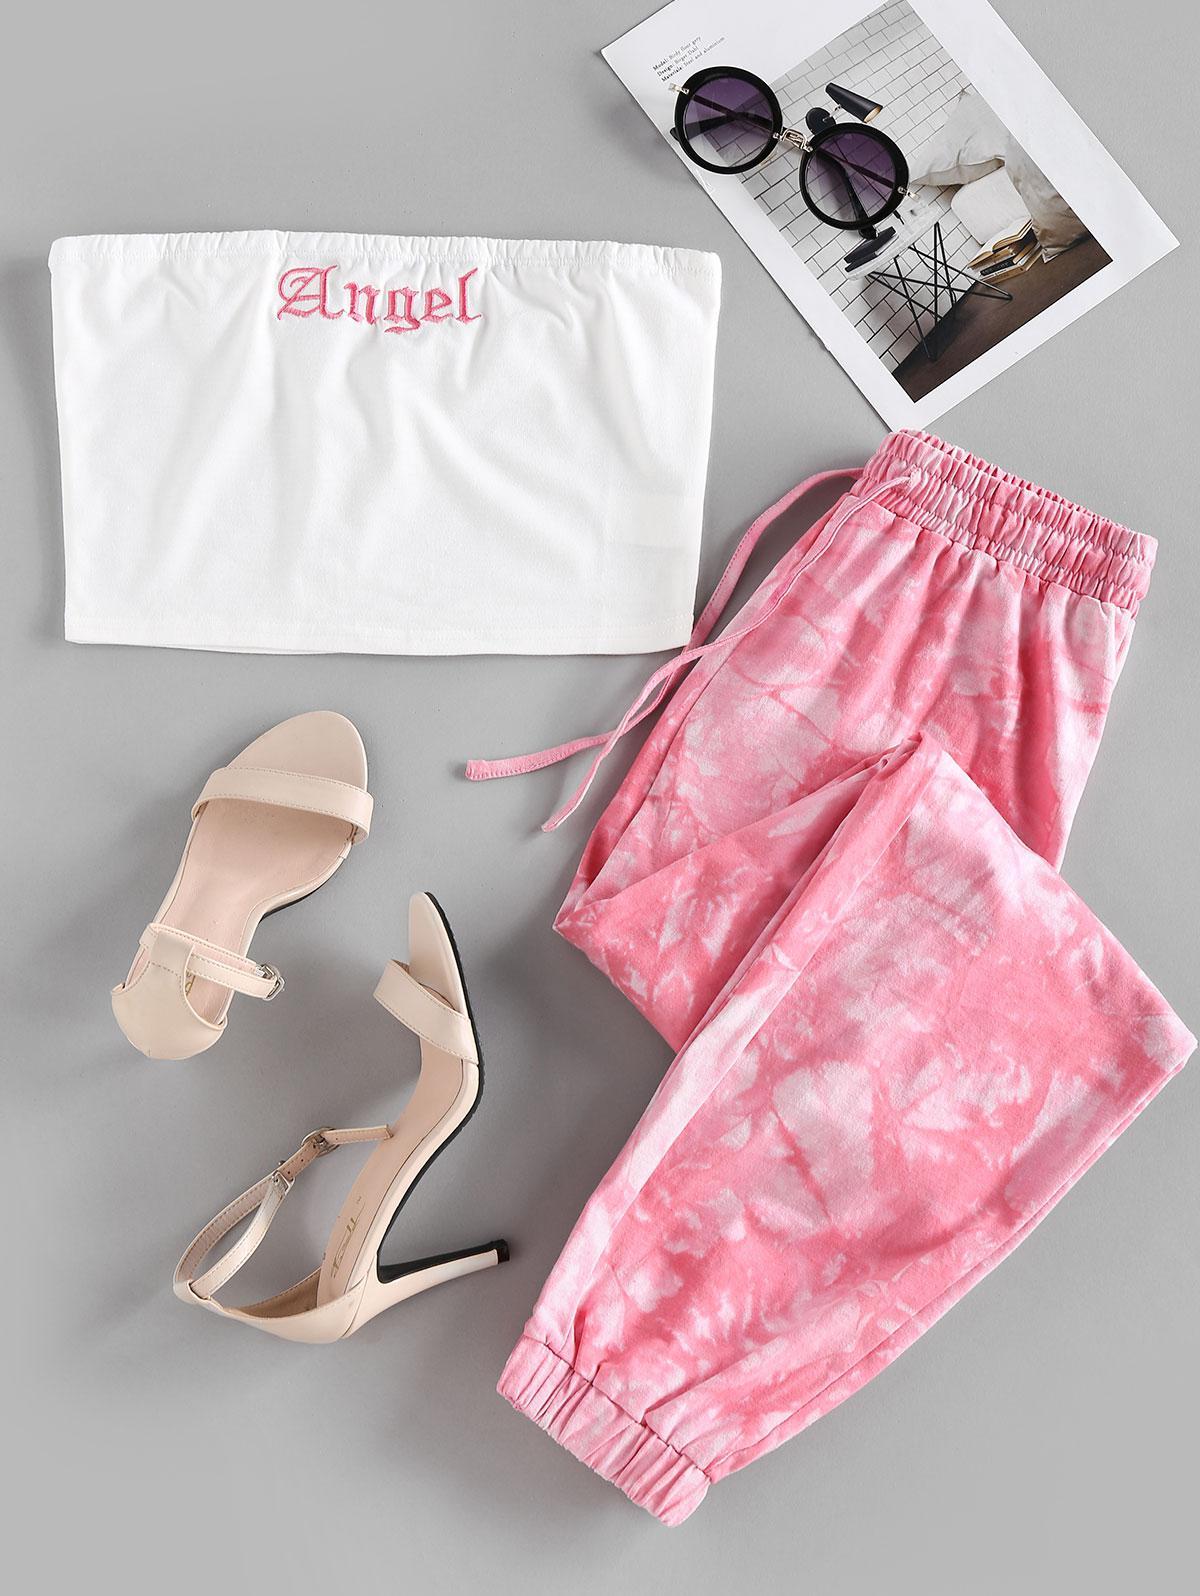 ZAFUL Tie Dye Angel Graphic Strapless Jogger Pants Set